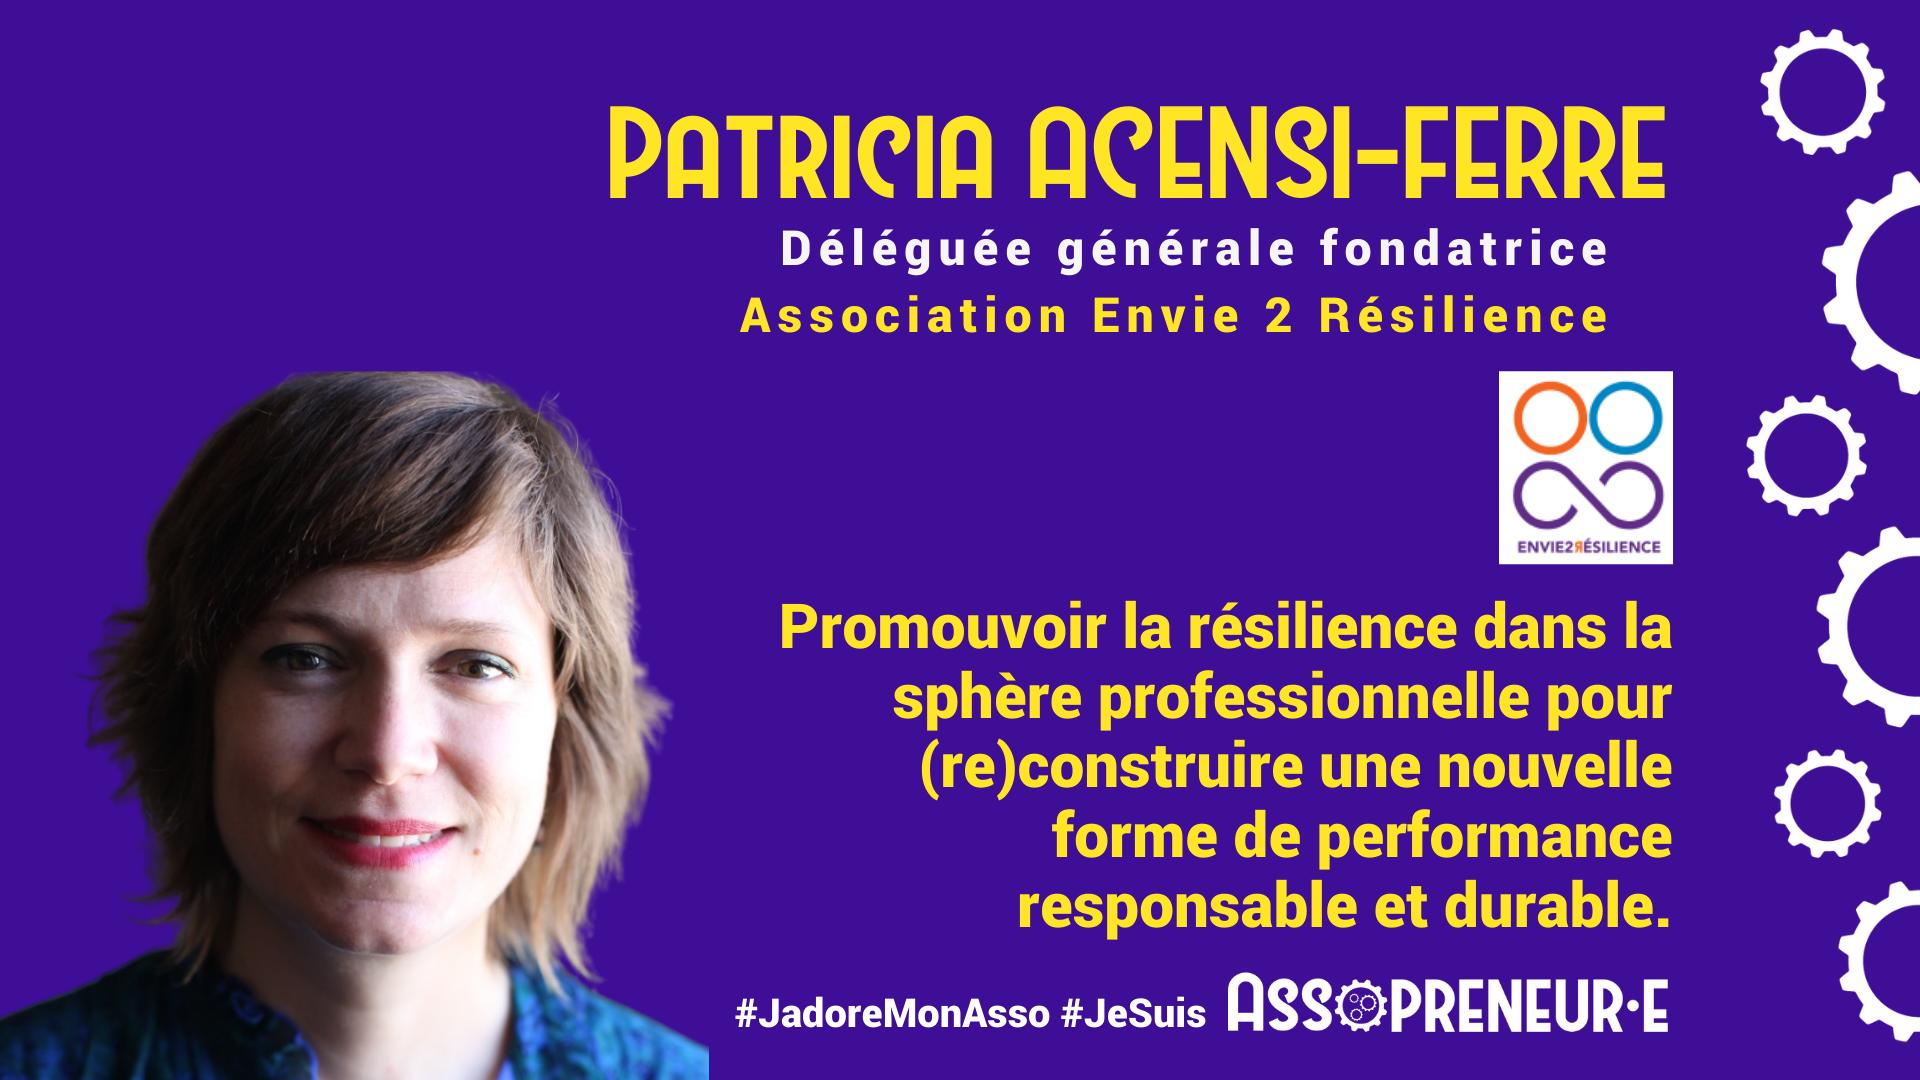 Patricia ACENSI FERRE membre programme Assopreneur